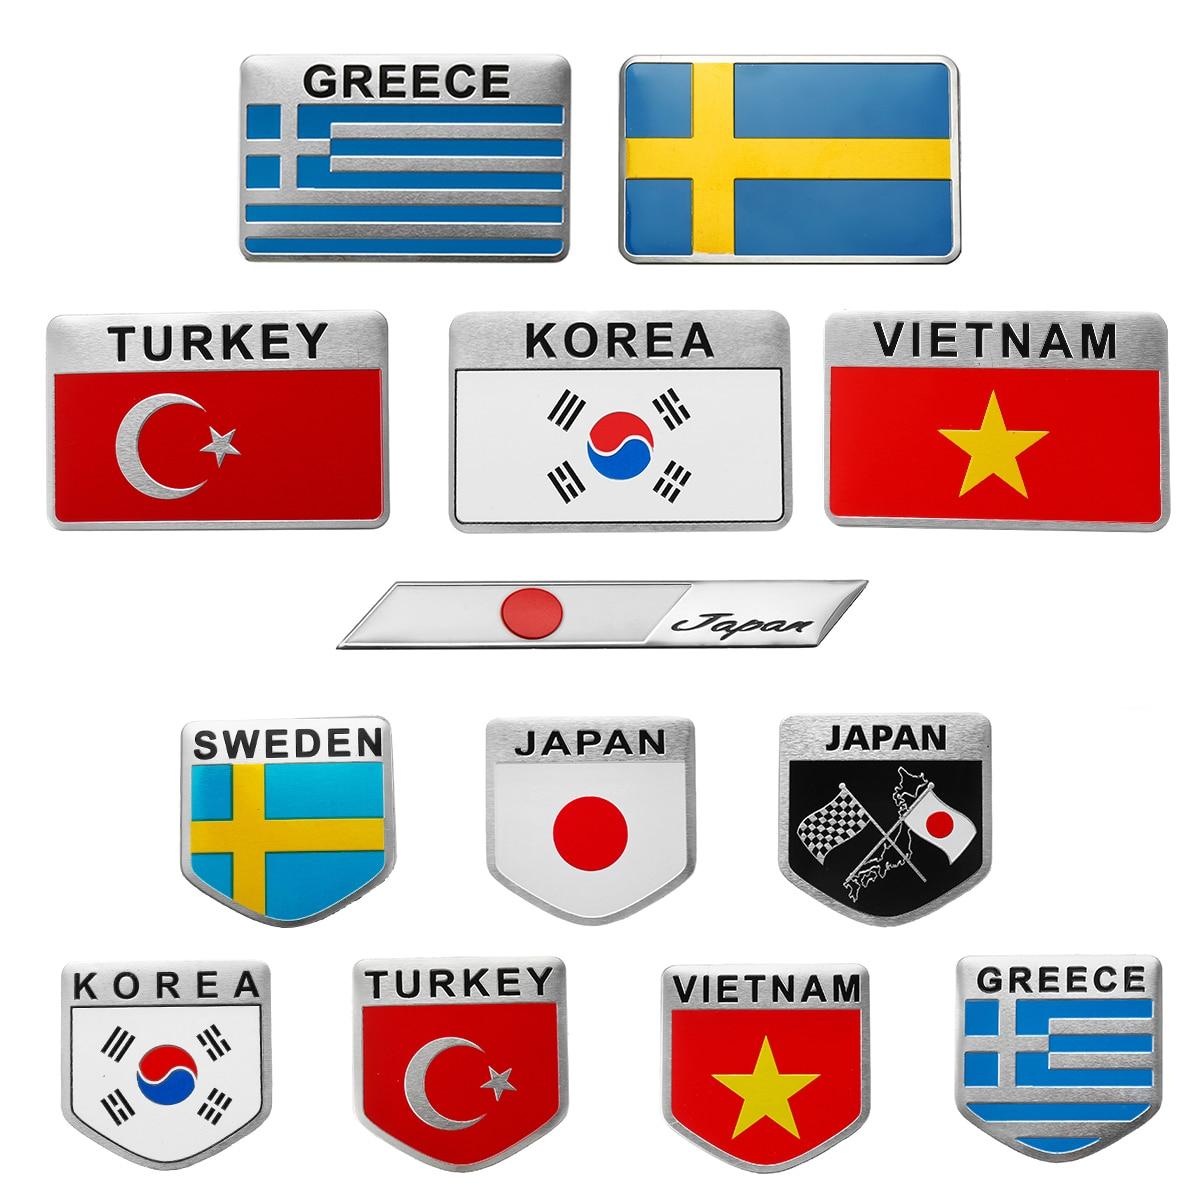 Turkey Sweden Greece Korea Vietnam Japan 3D Car Auto Sticker Decal Flag Sticker Decal Emblem Badge Aluminum Alloy